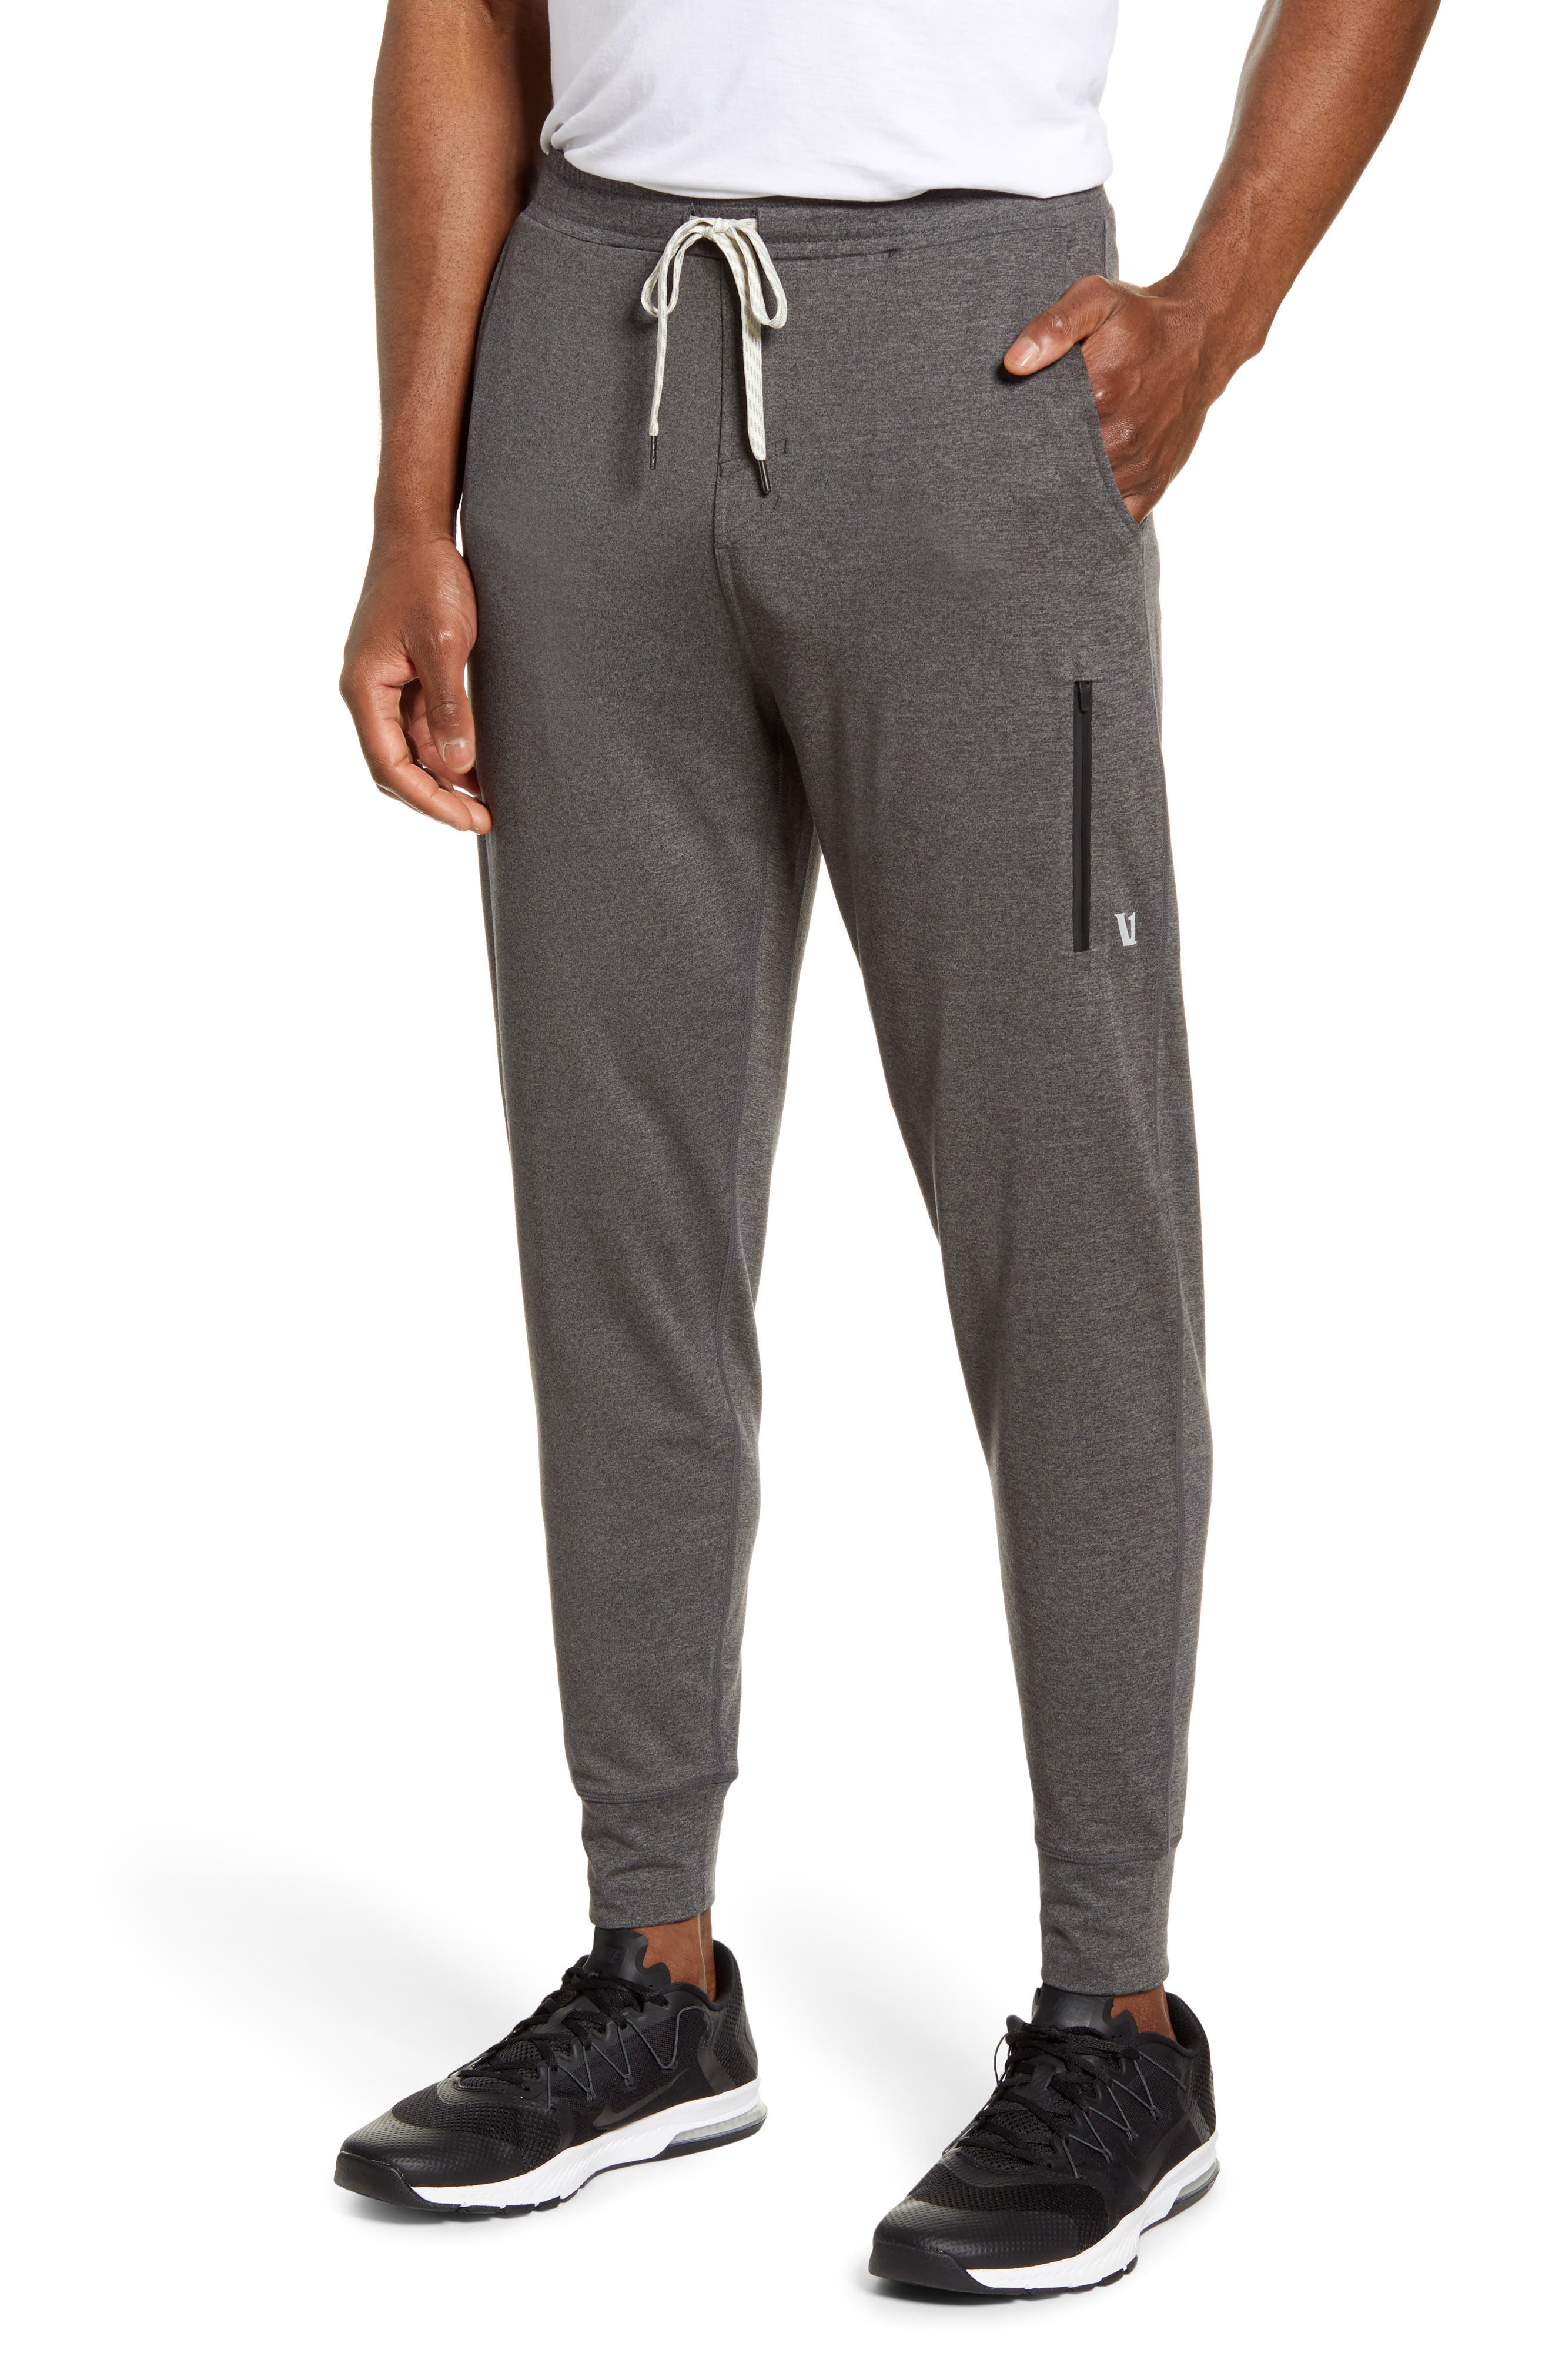 Vertical Sport JG4 Joggers Sweatpants Mens Size XL color dark gray new with tag